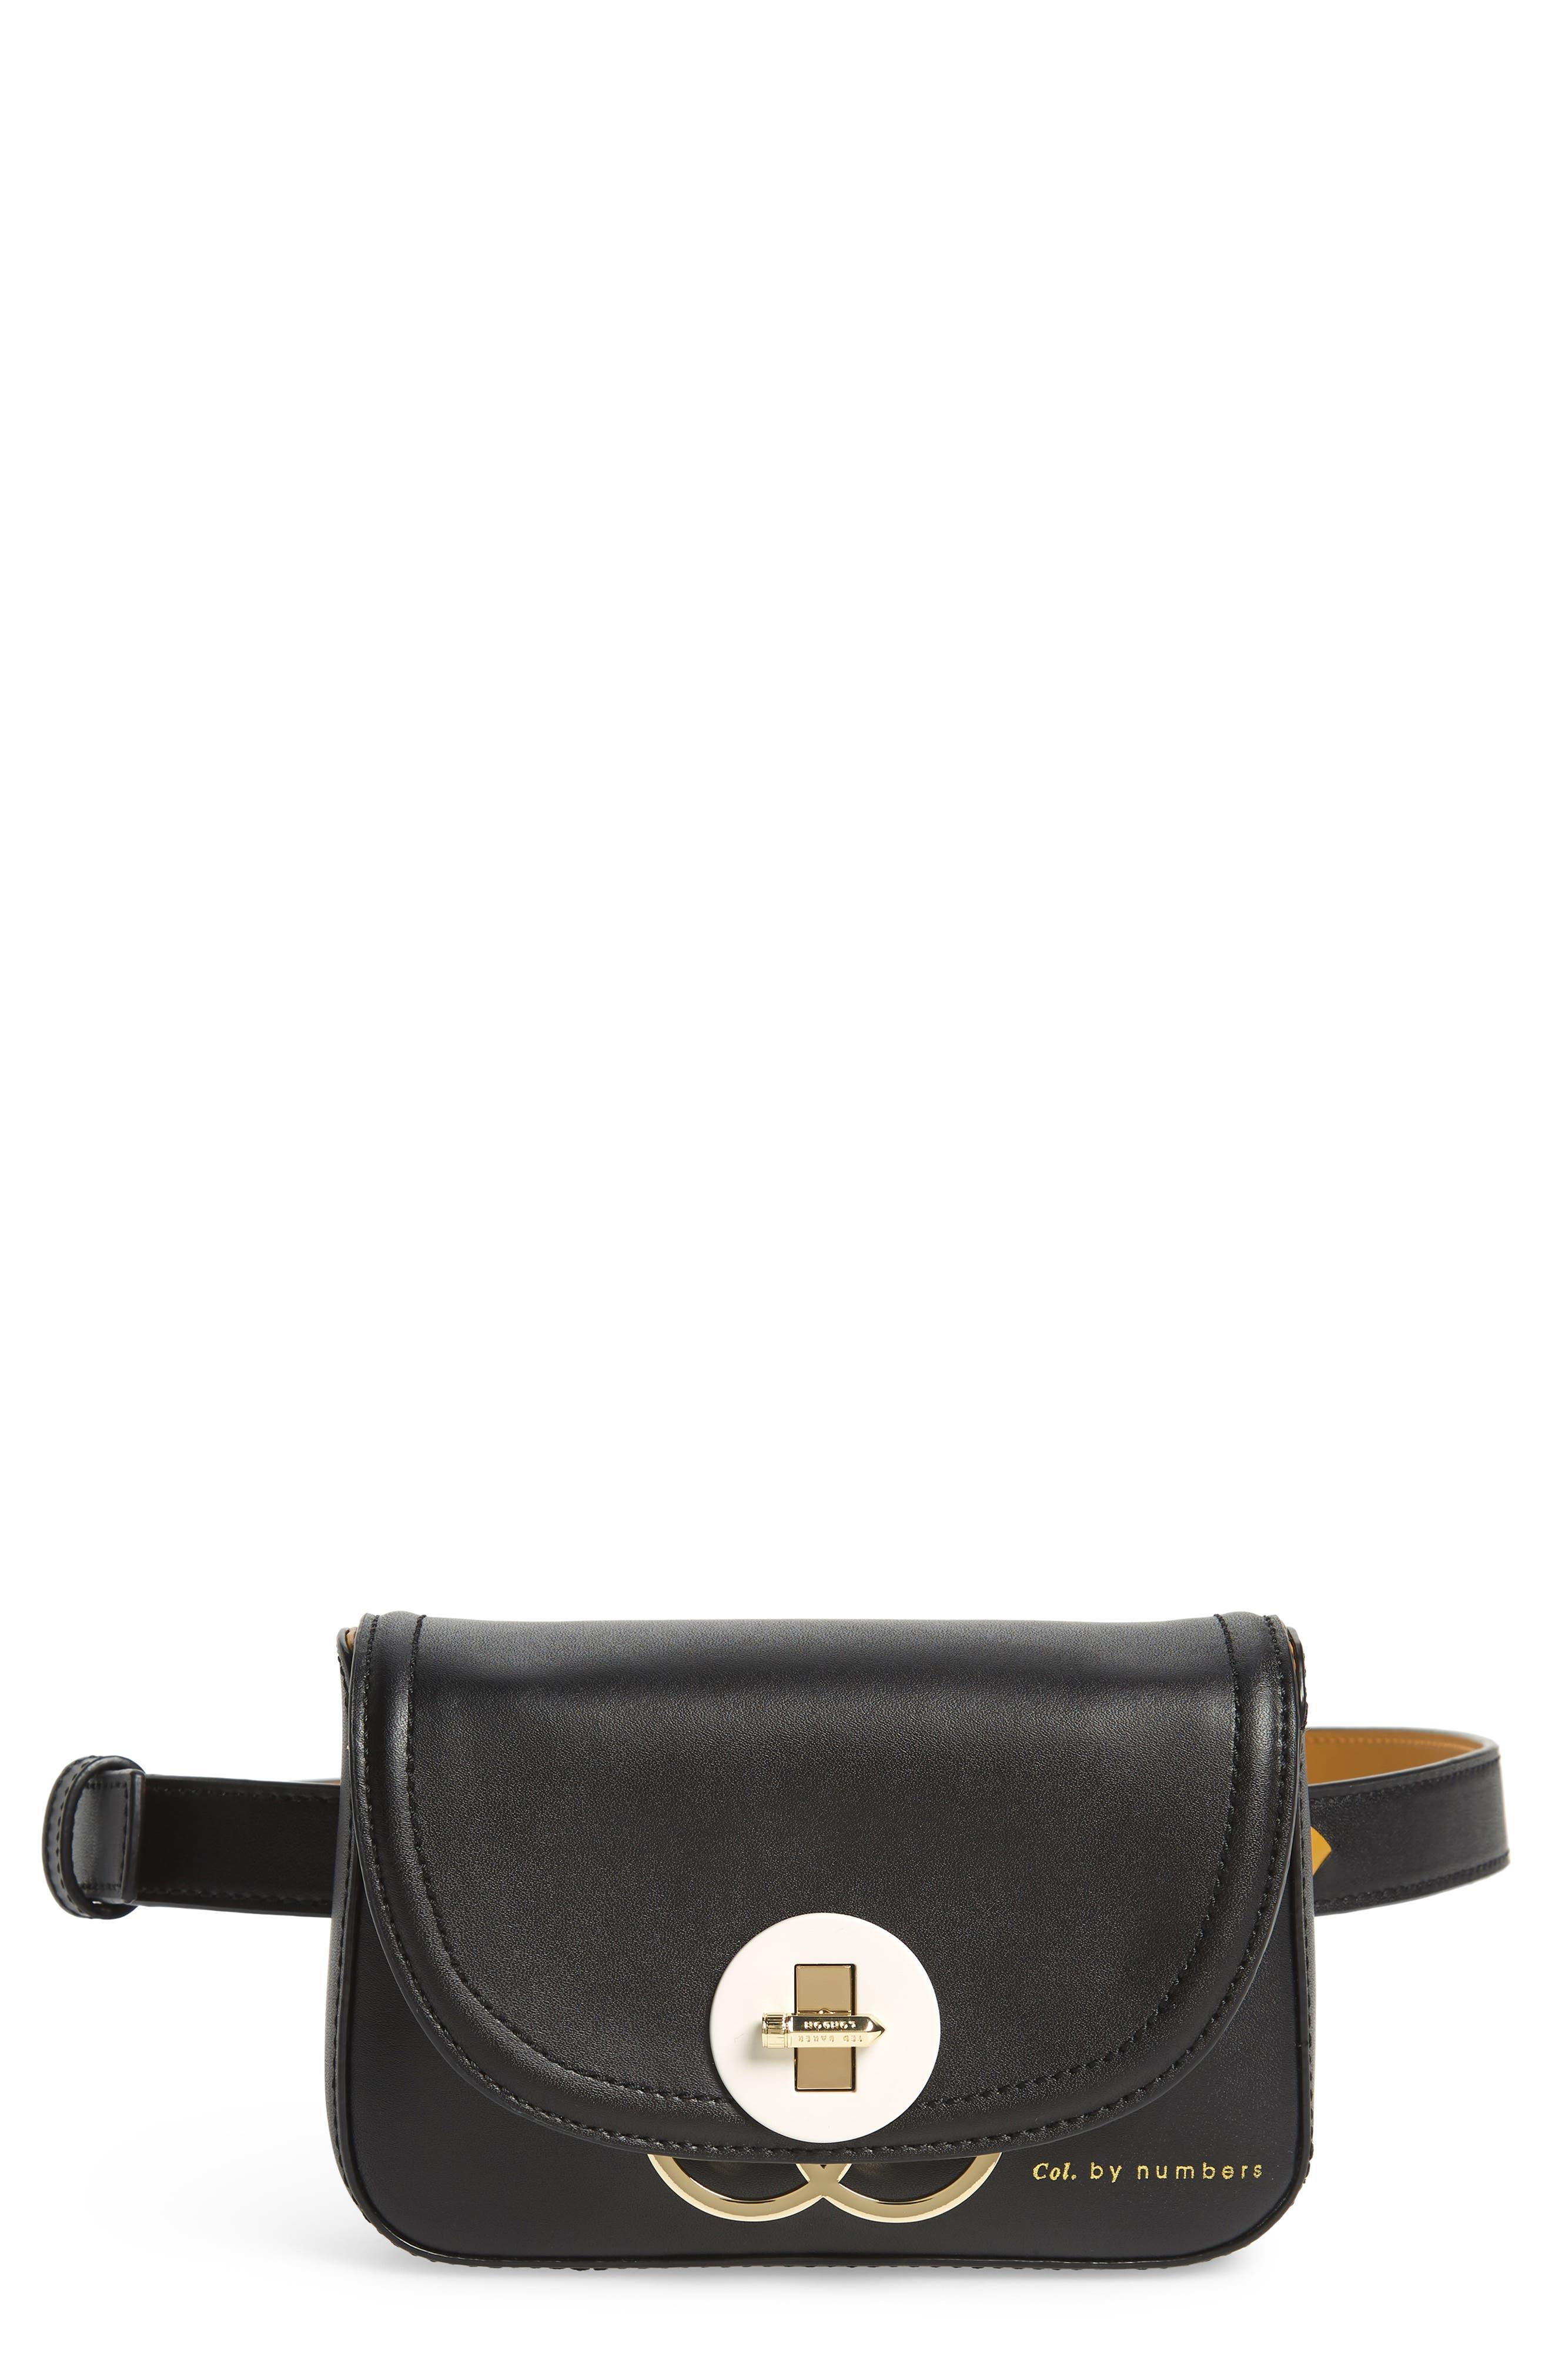 TED BAKER LONDON Colour by Numbers Krakan Leather Belt Bag, Main, color, BLACK